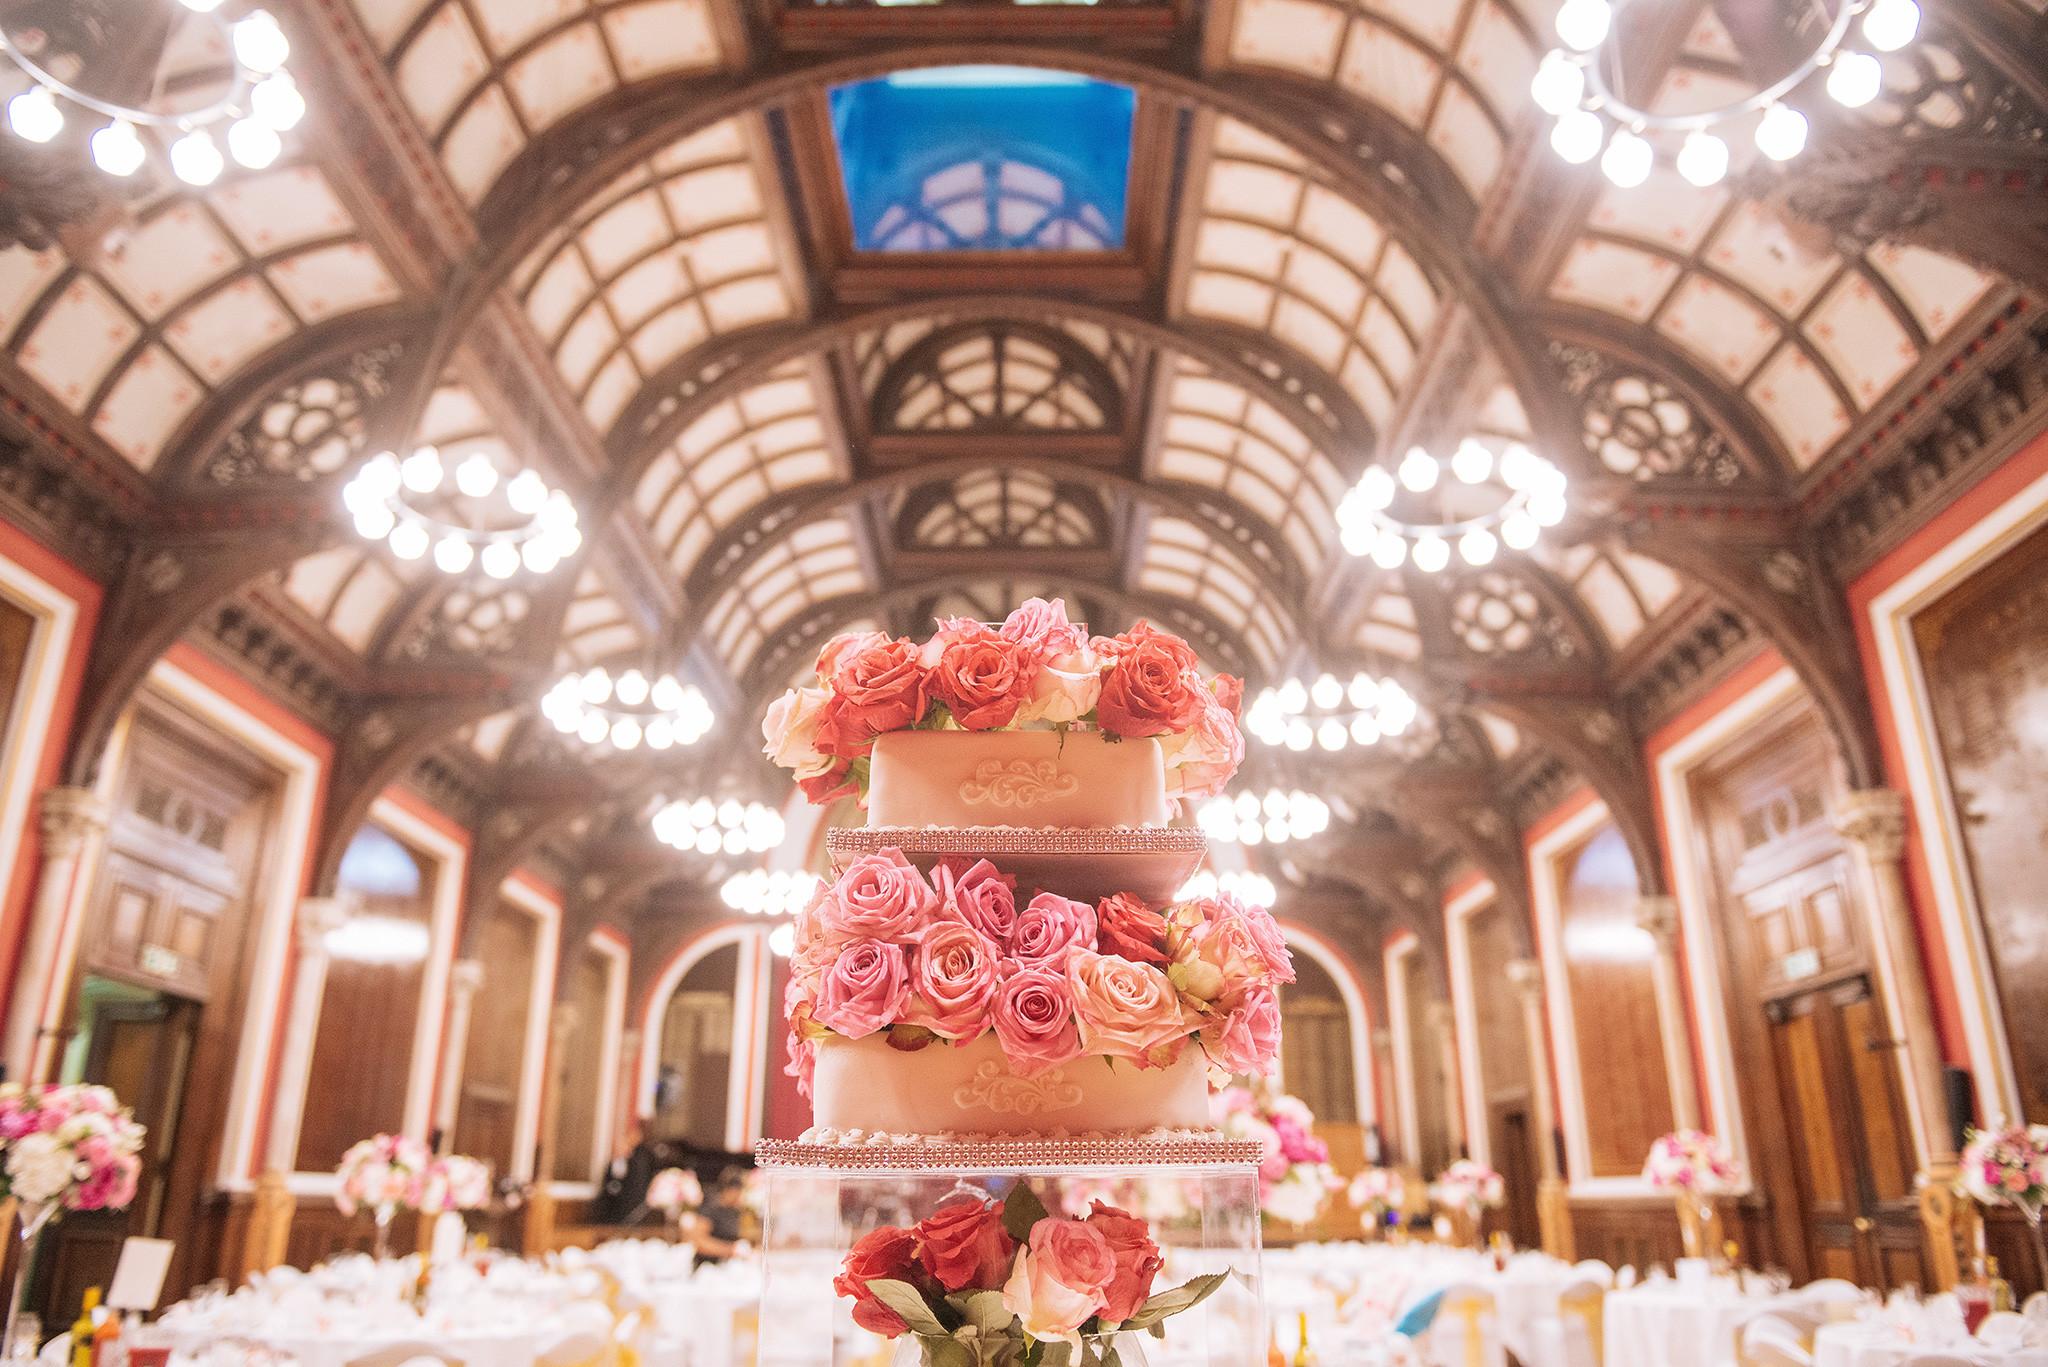 40th Wedding Anniversary captured by Daniel Morales/Splento